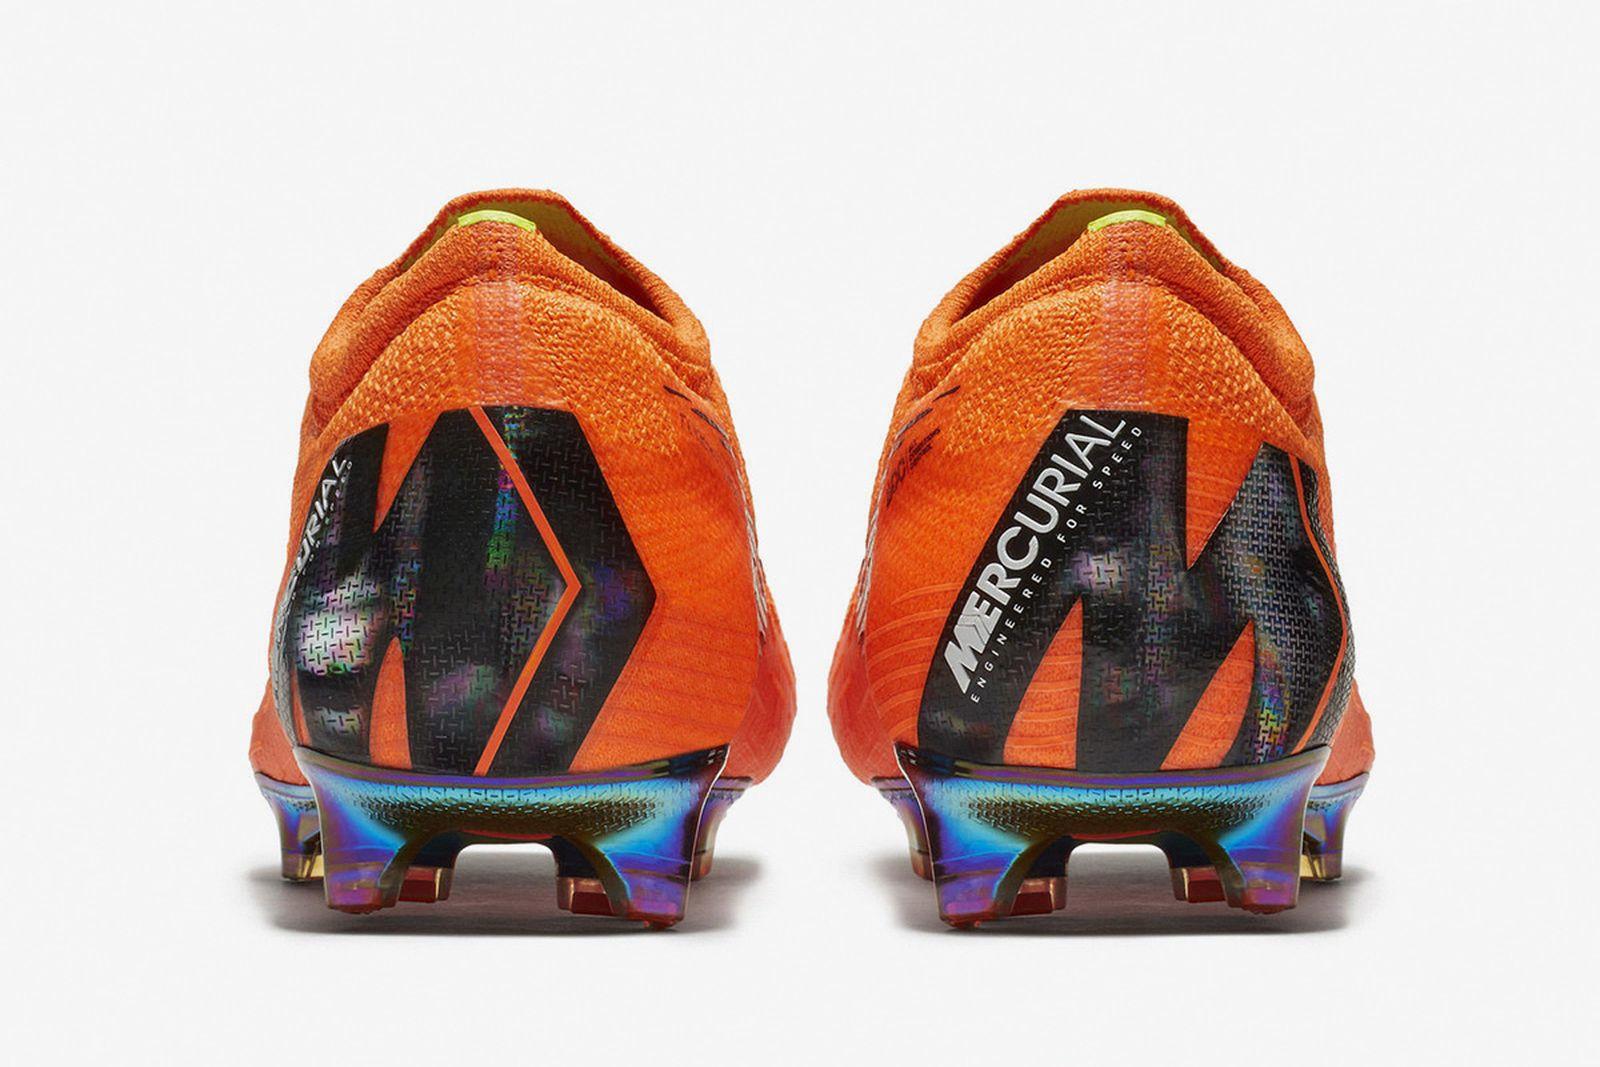 nike-mercurial-superfly-football-boot-023